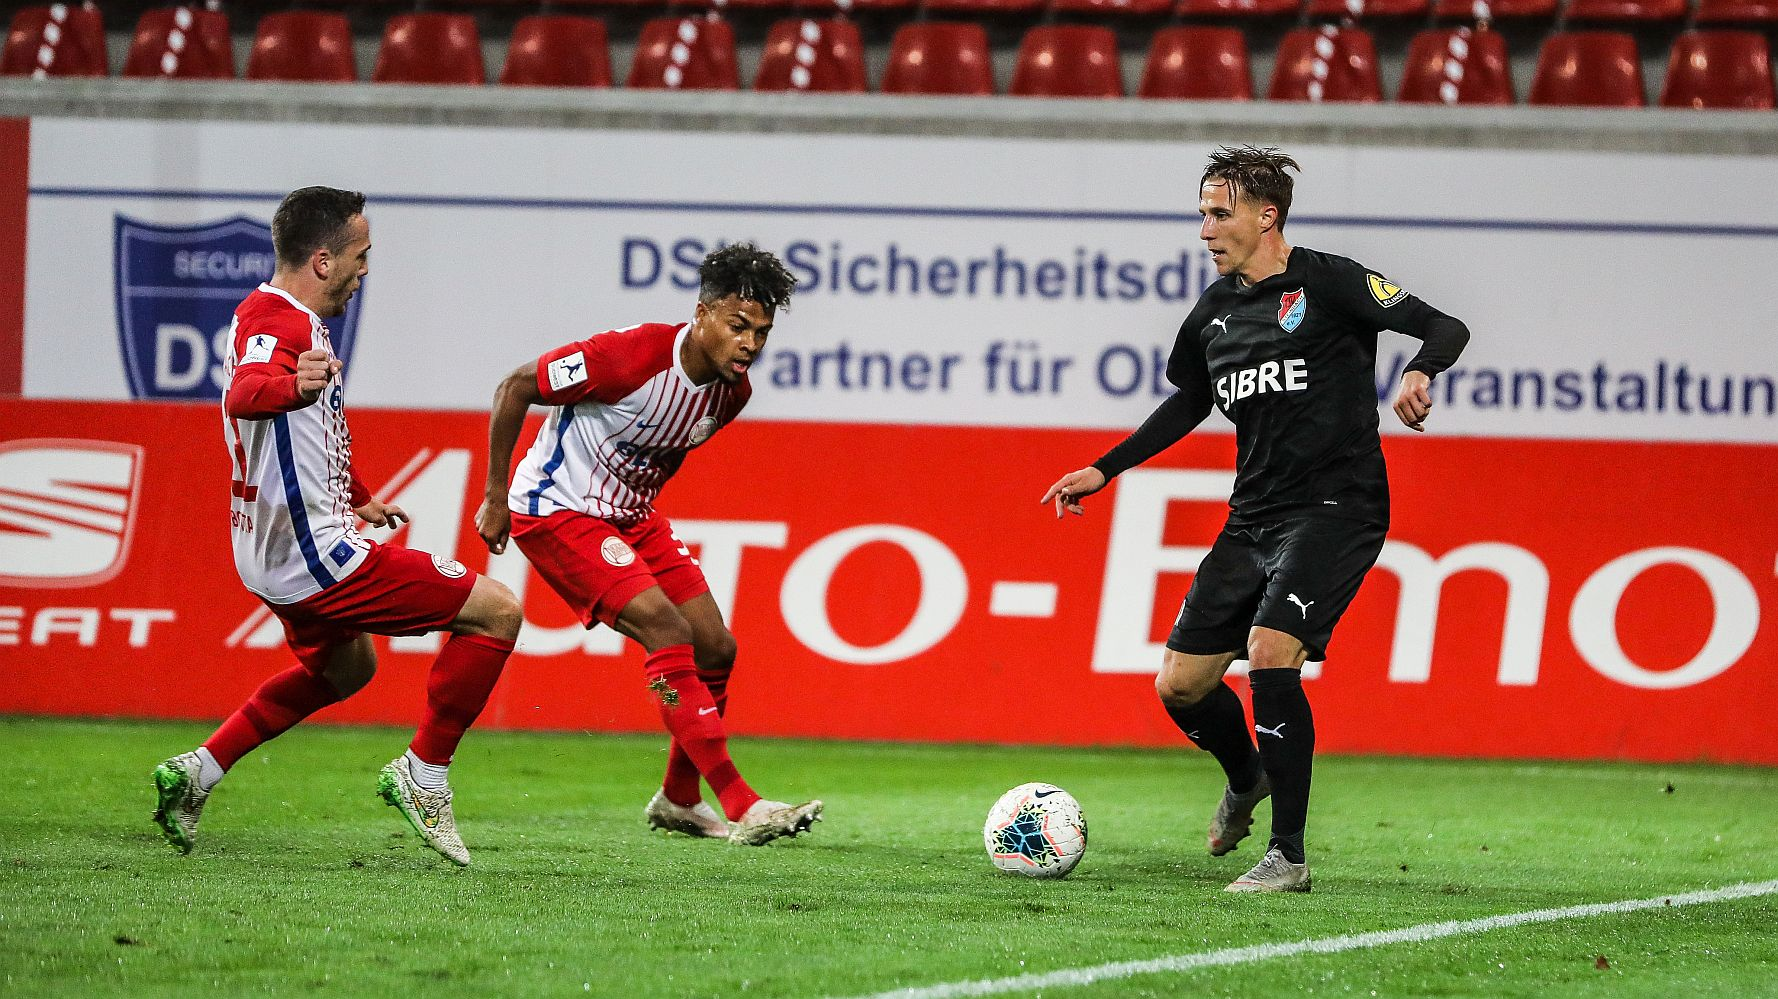 Florian Bichler TSV Steinbach Haiger Kickers Offenbach Björn Franz